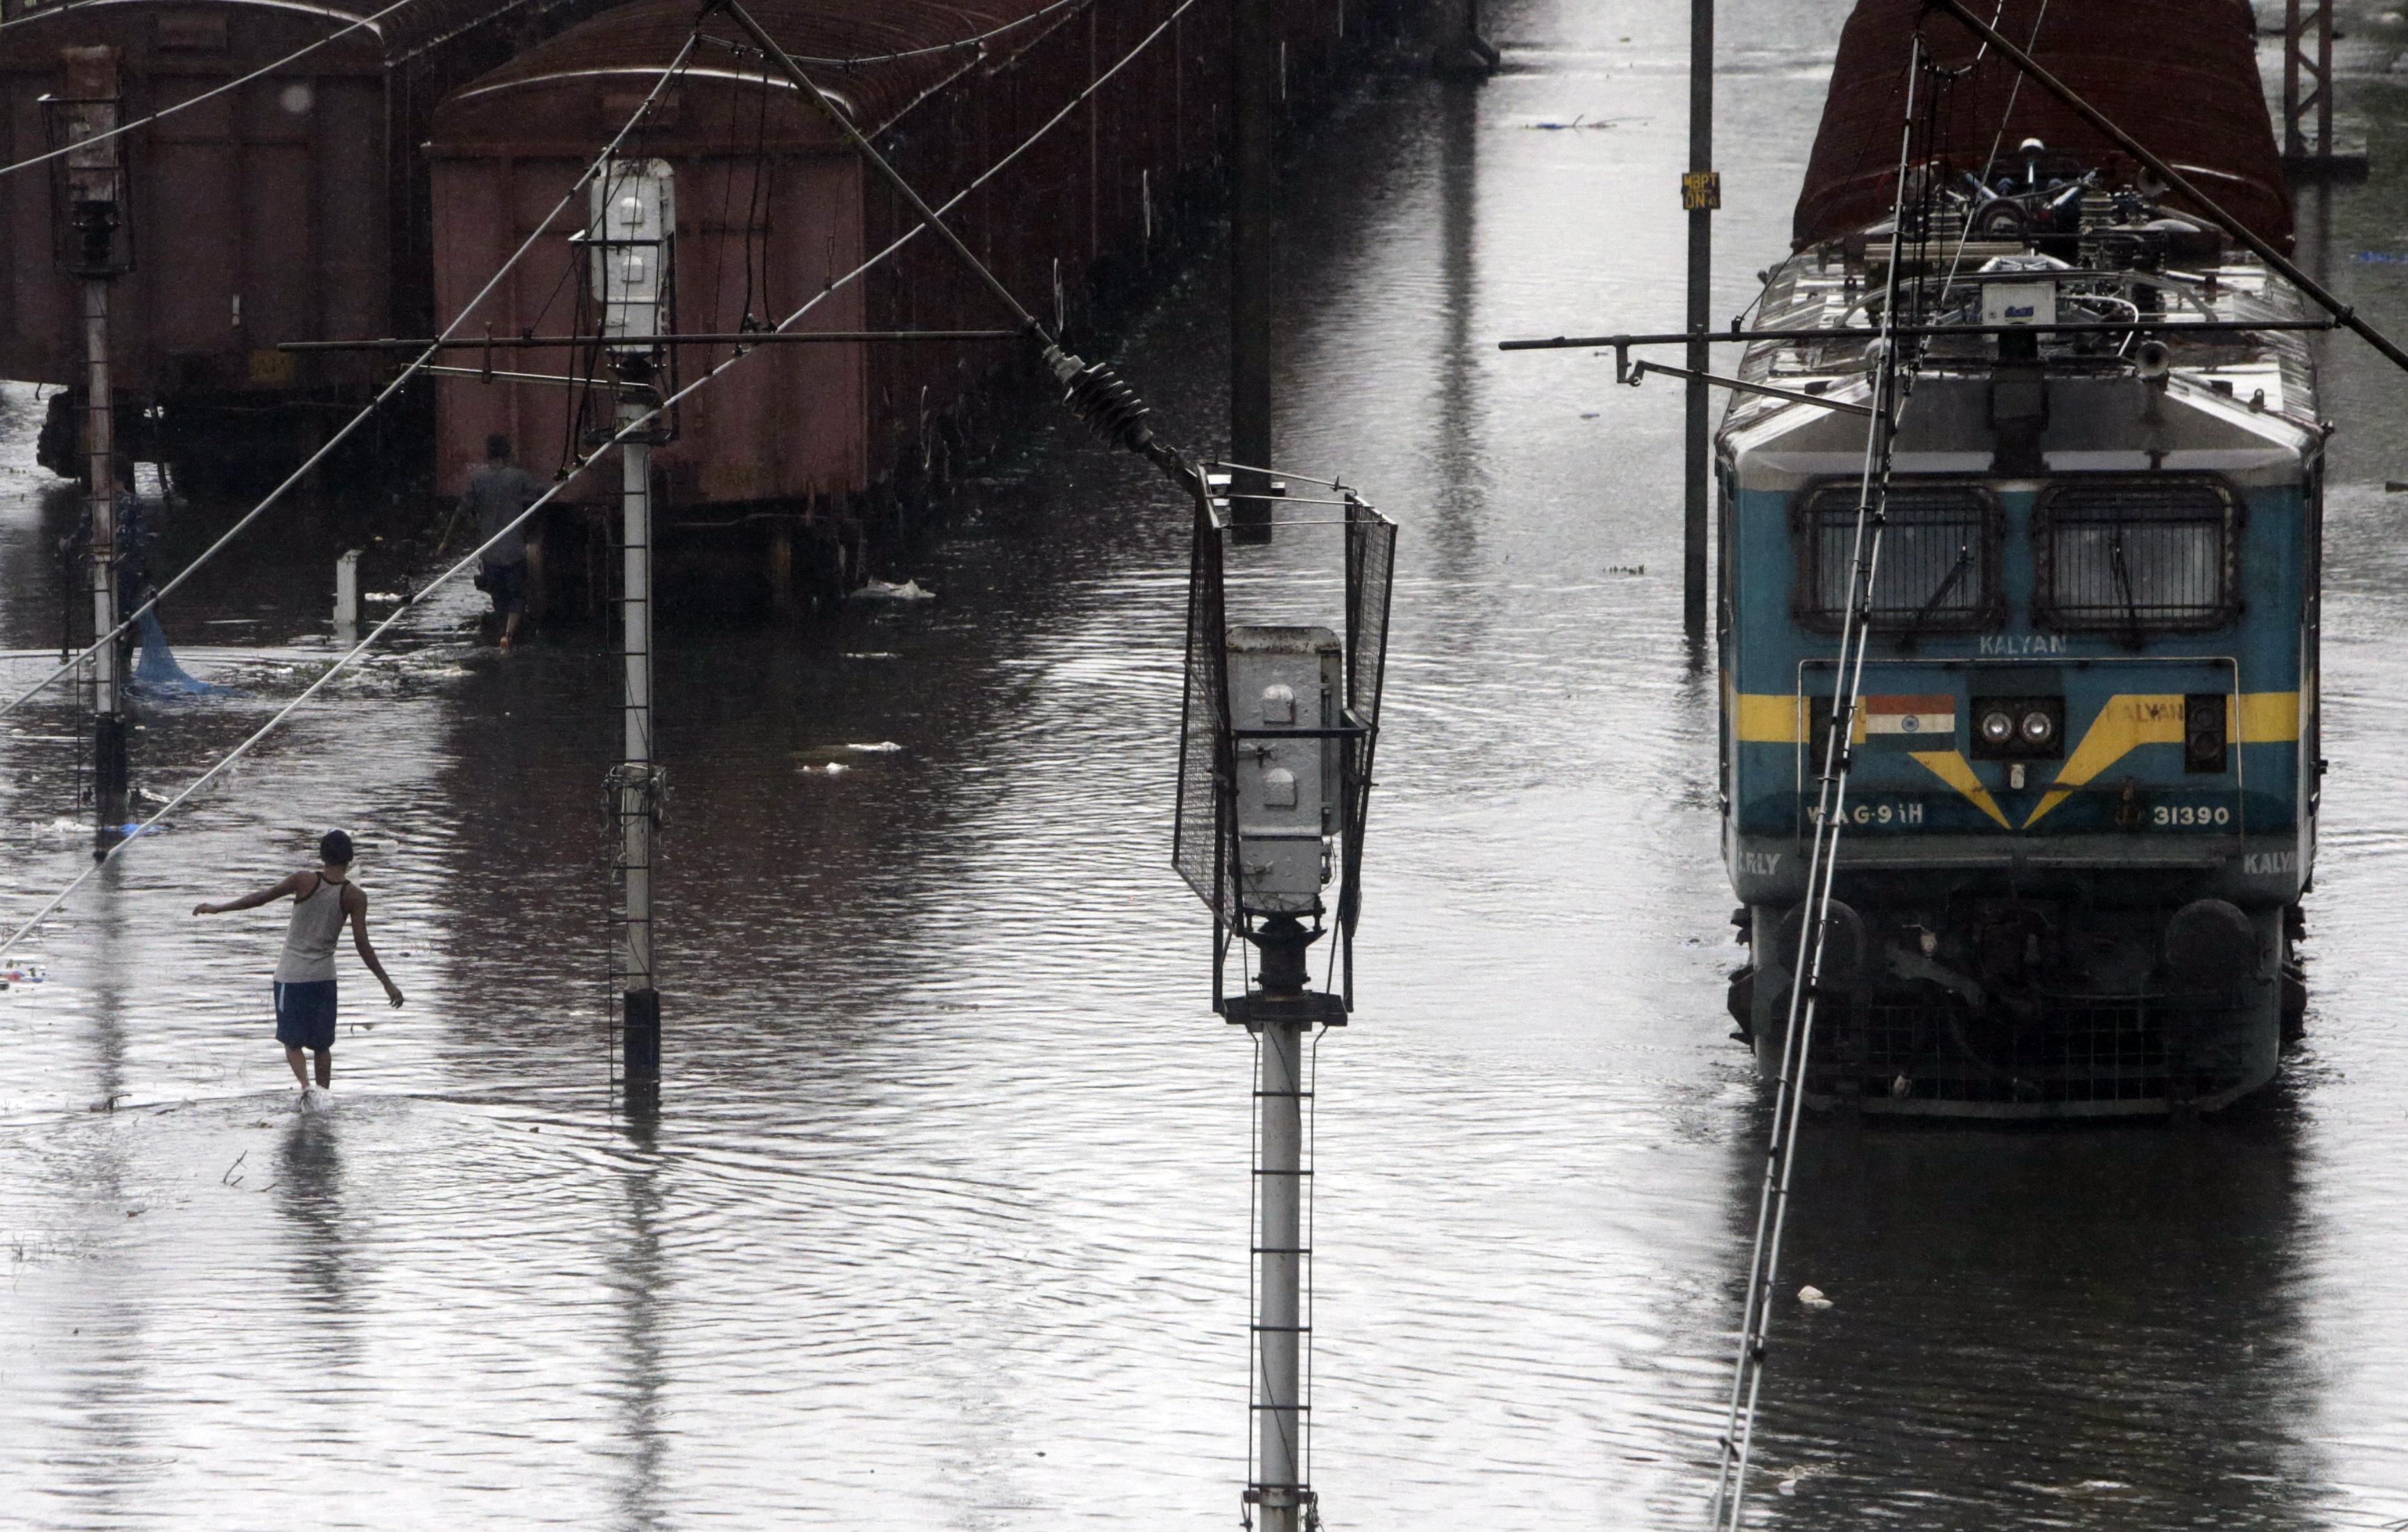 Mumbai gets heaviest rainfall since 2005: Twitter flooded with anguish